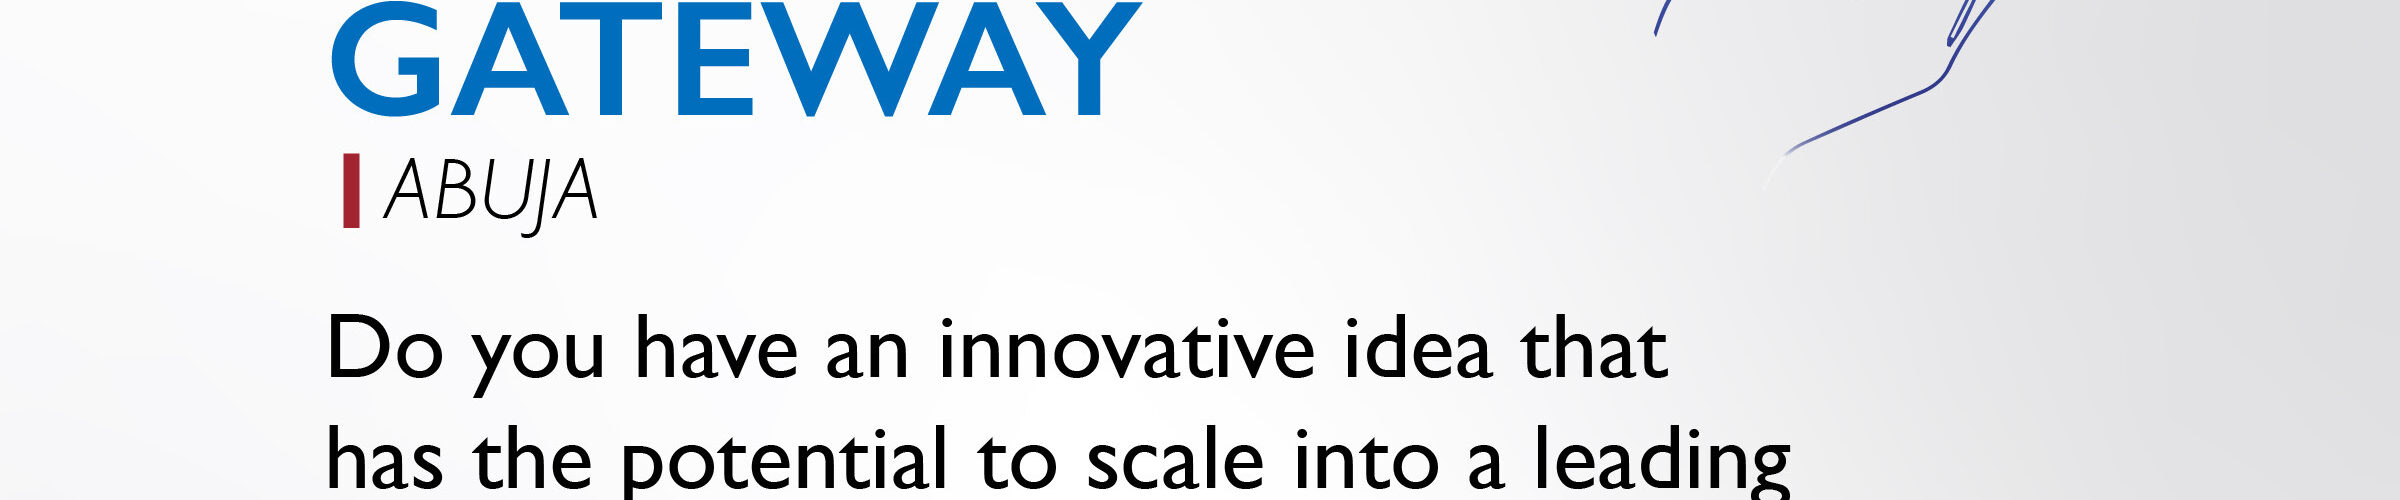 startup fundings